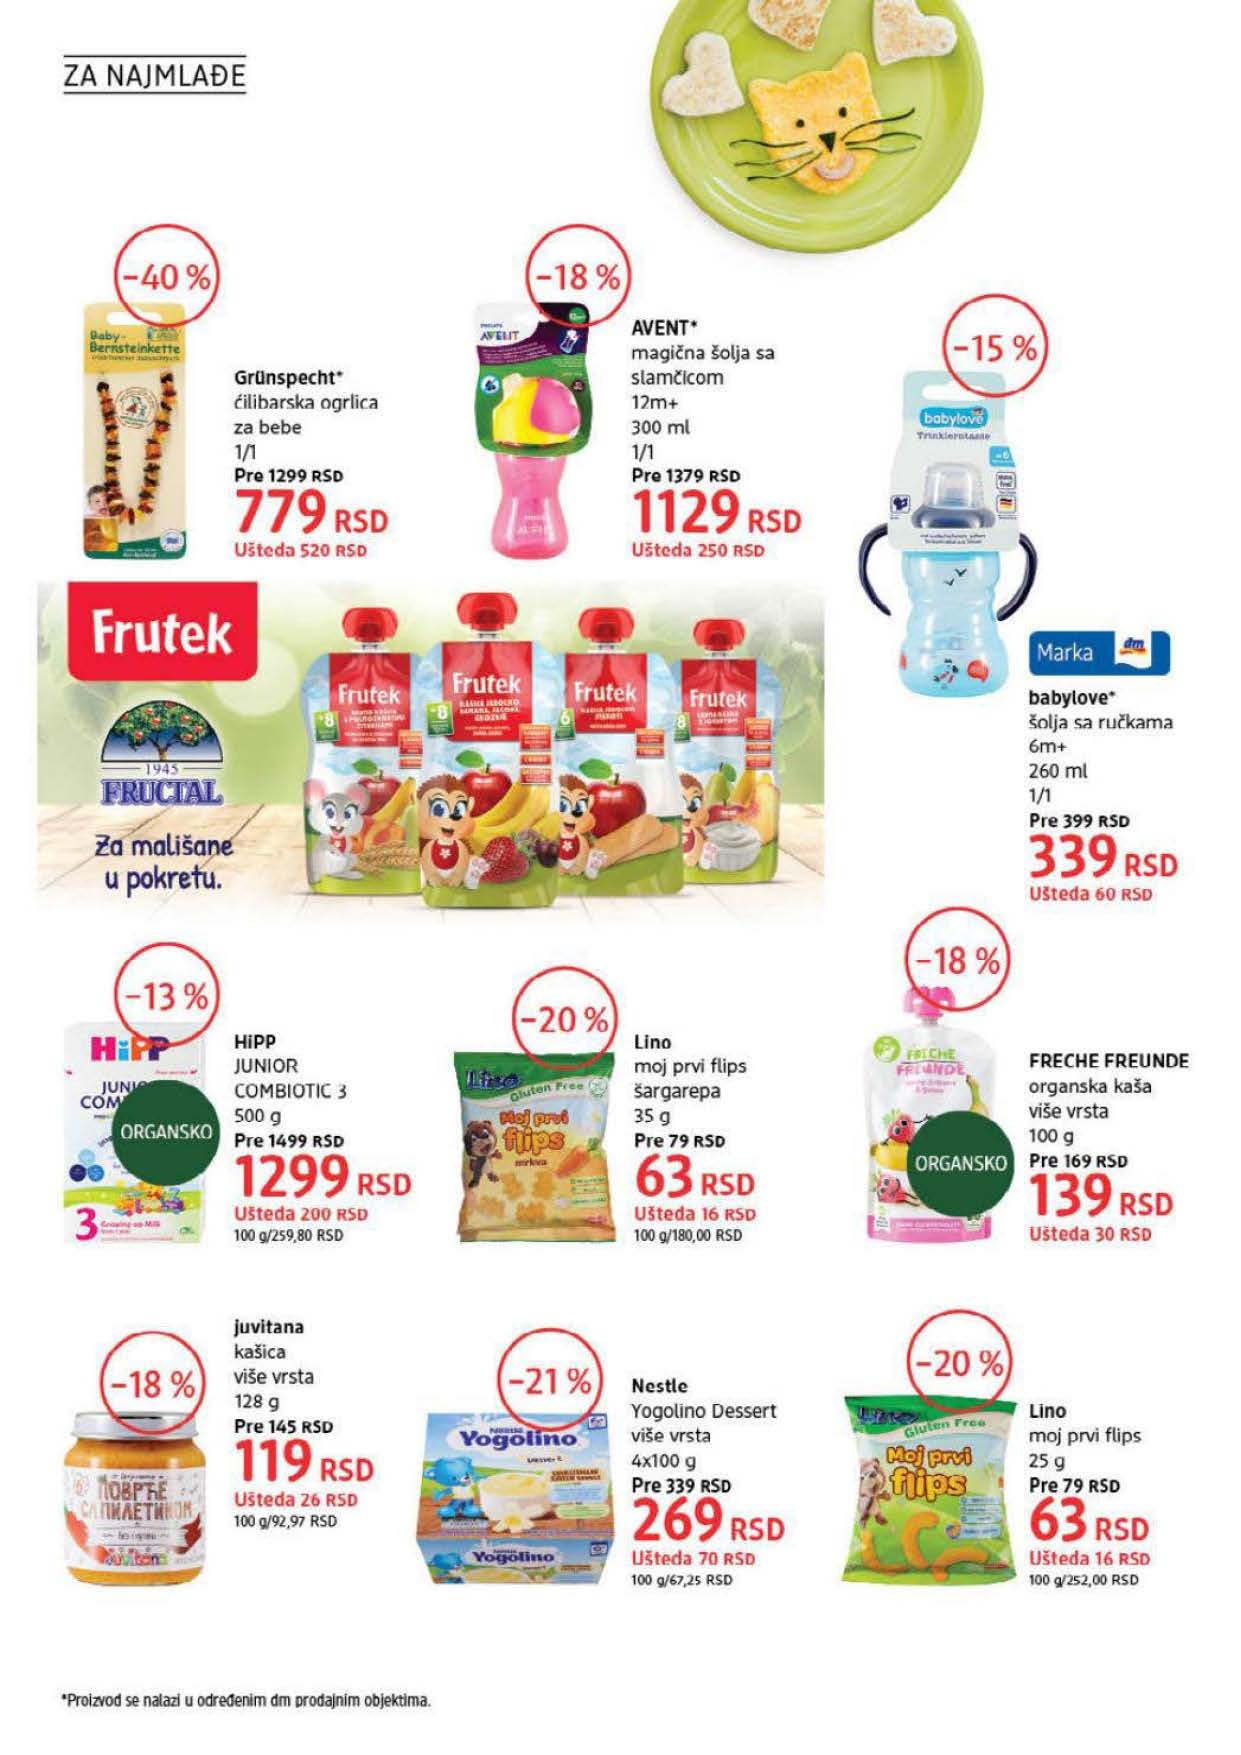 DM Katalog Srbija SEPTEMBAR 2021 1.9.2021. 30.9.2021. Page 30